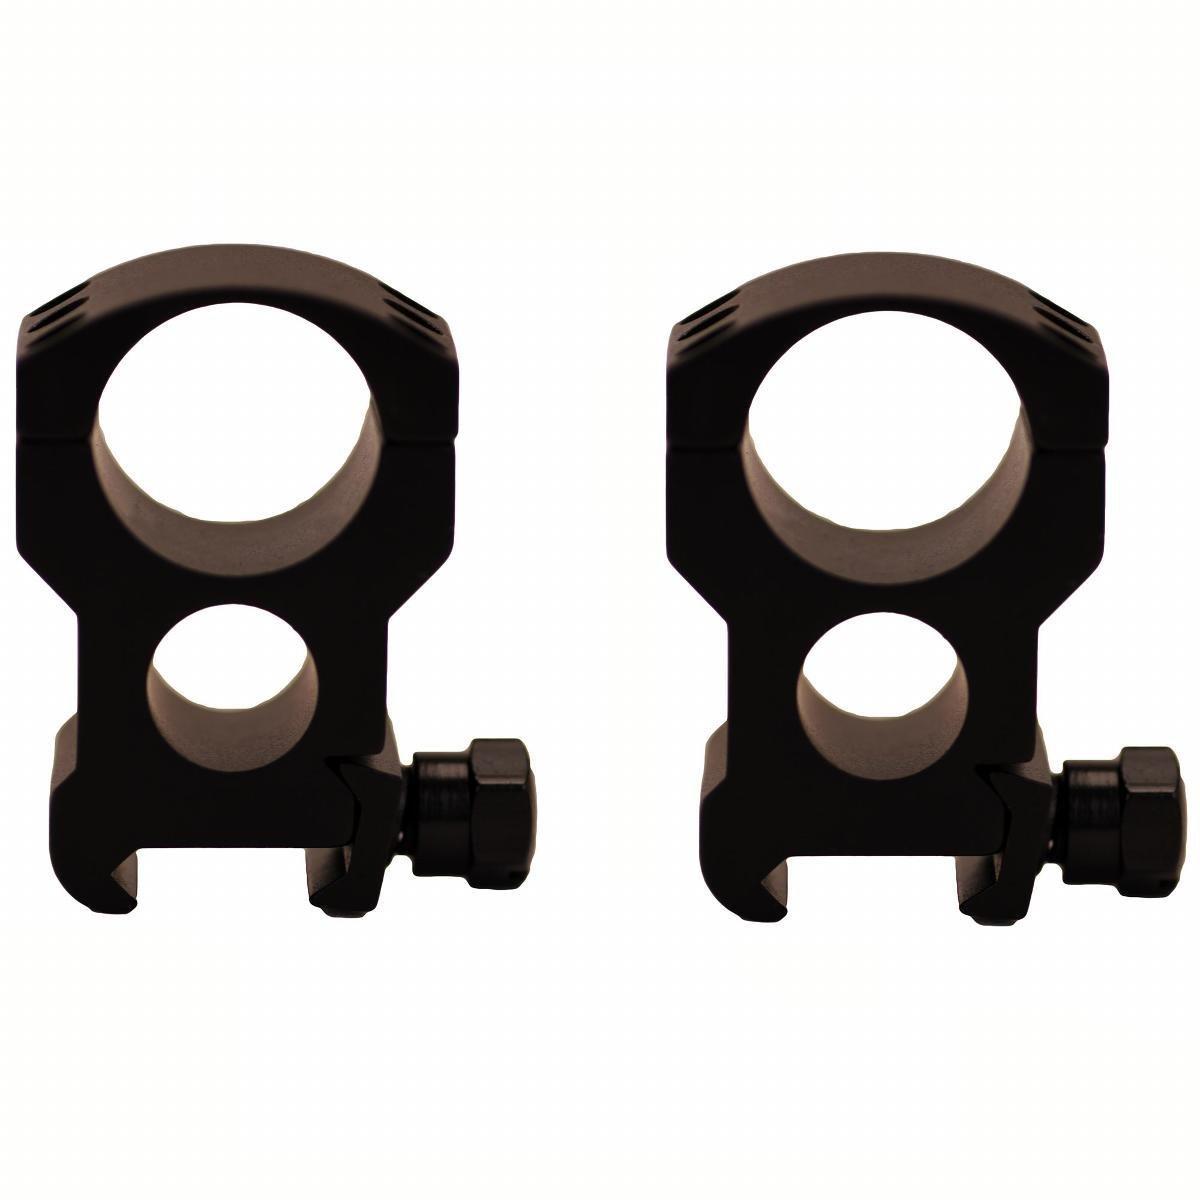 Brandnameinternalx 1-Inch Rings Burris 420183 Xtreme Tacticalx 40mm